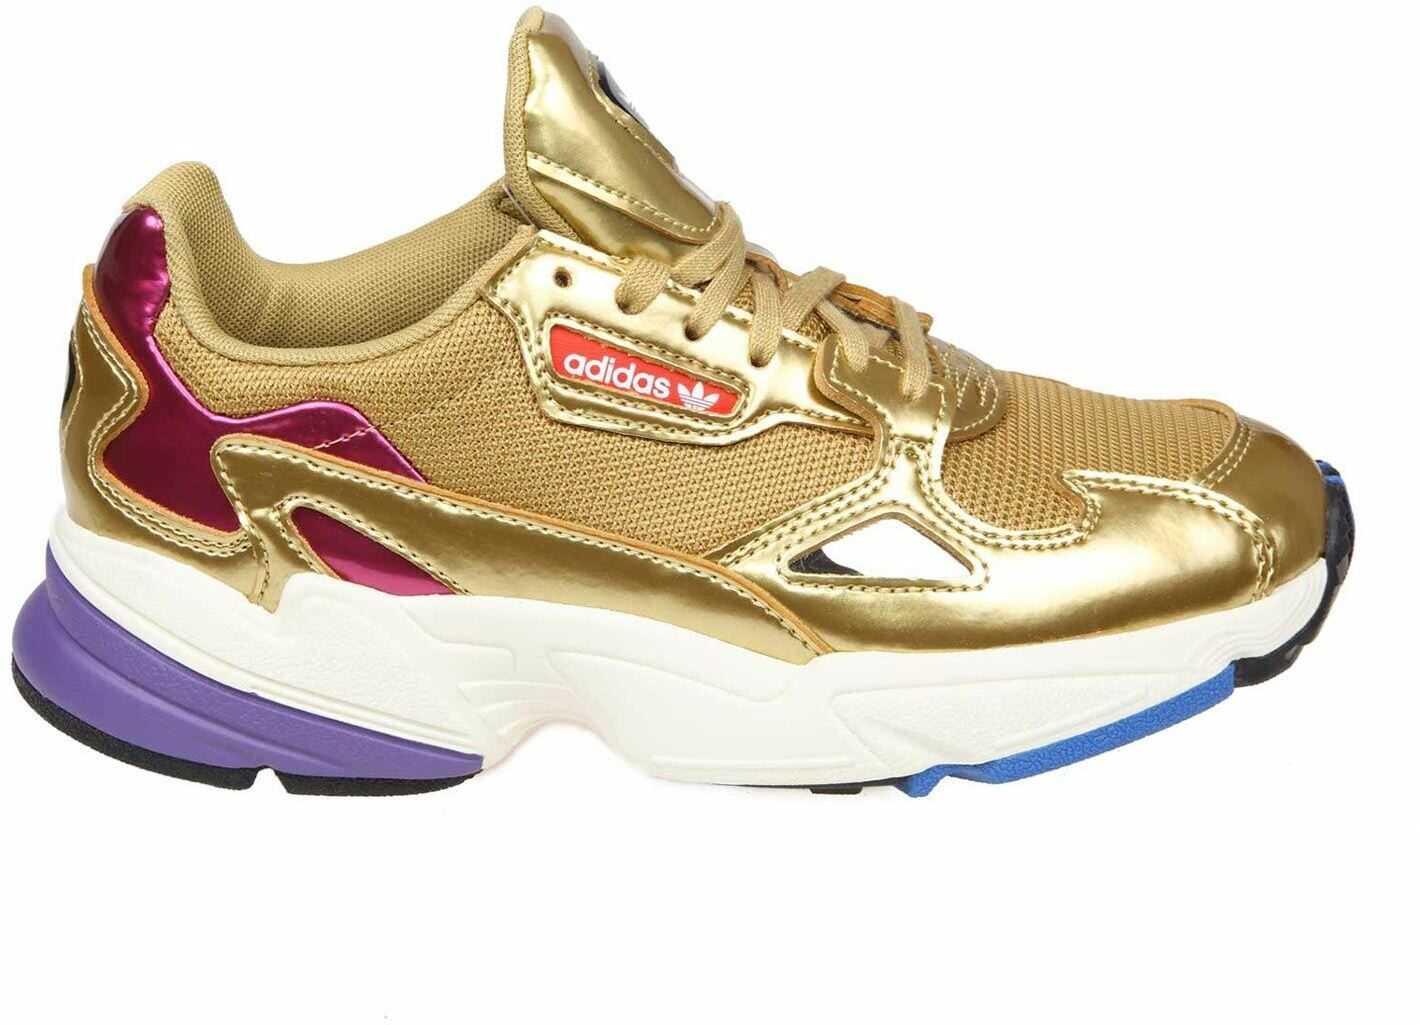 adidas Originals Falcon Golden Sneakers Gold